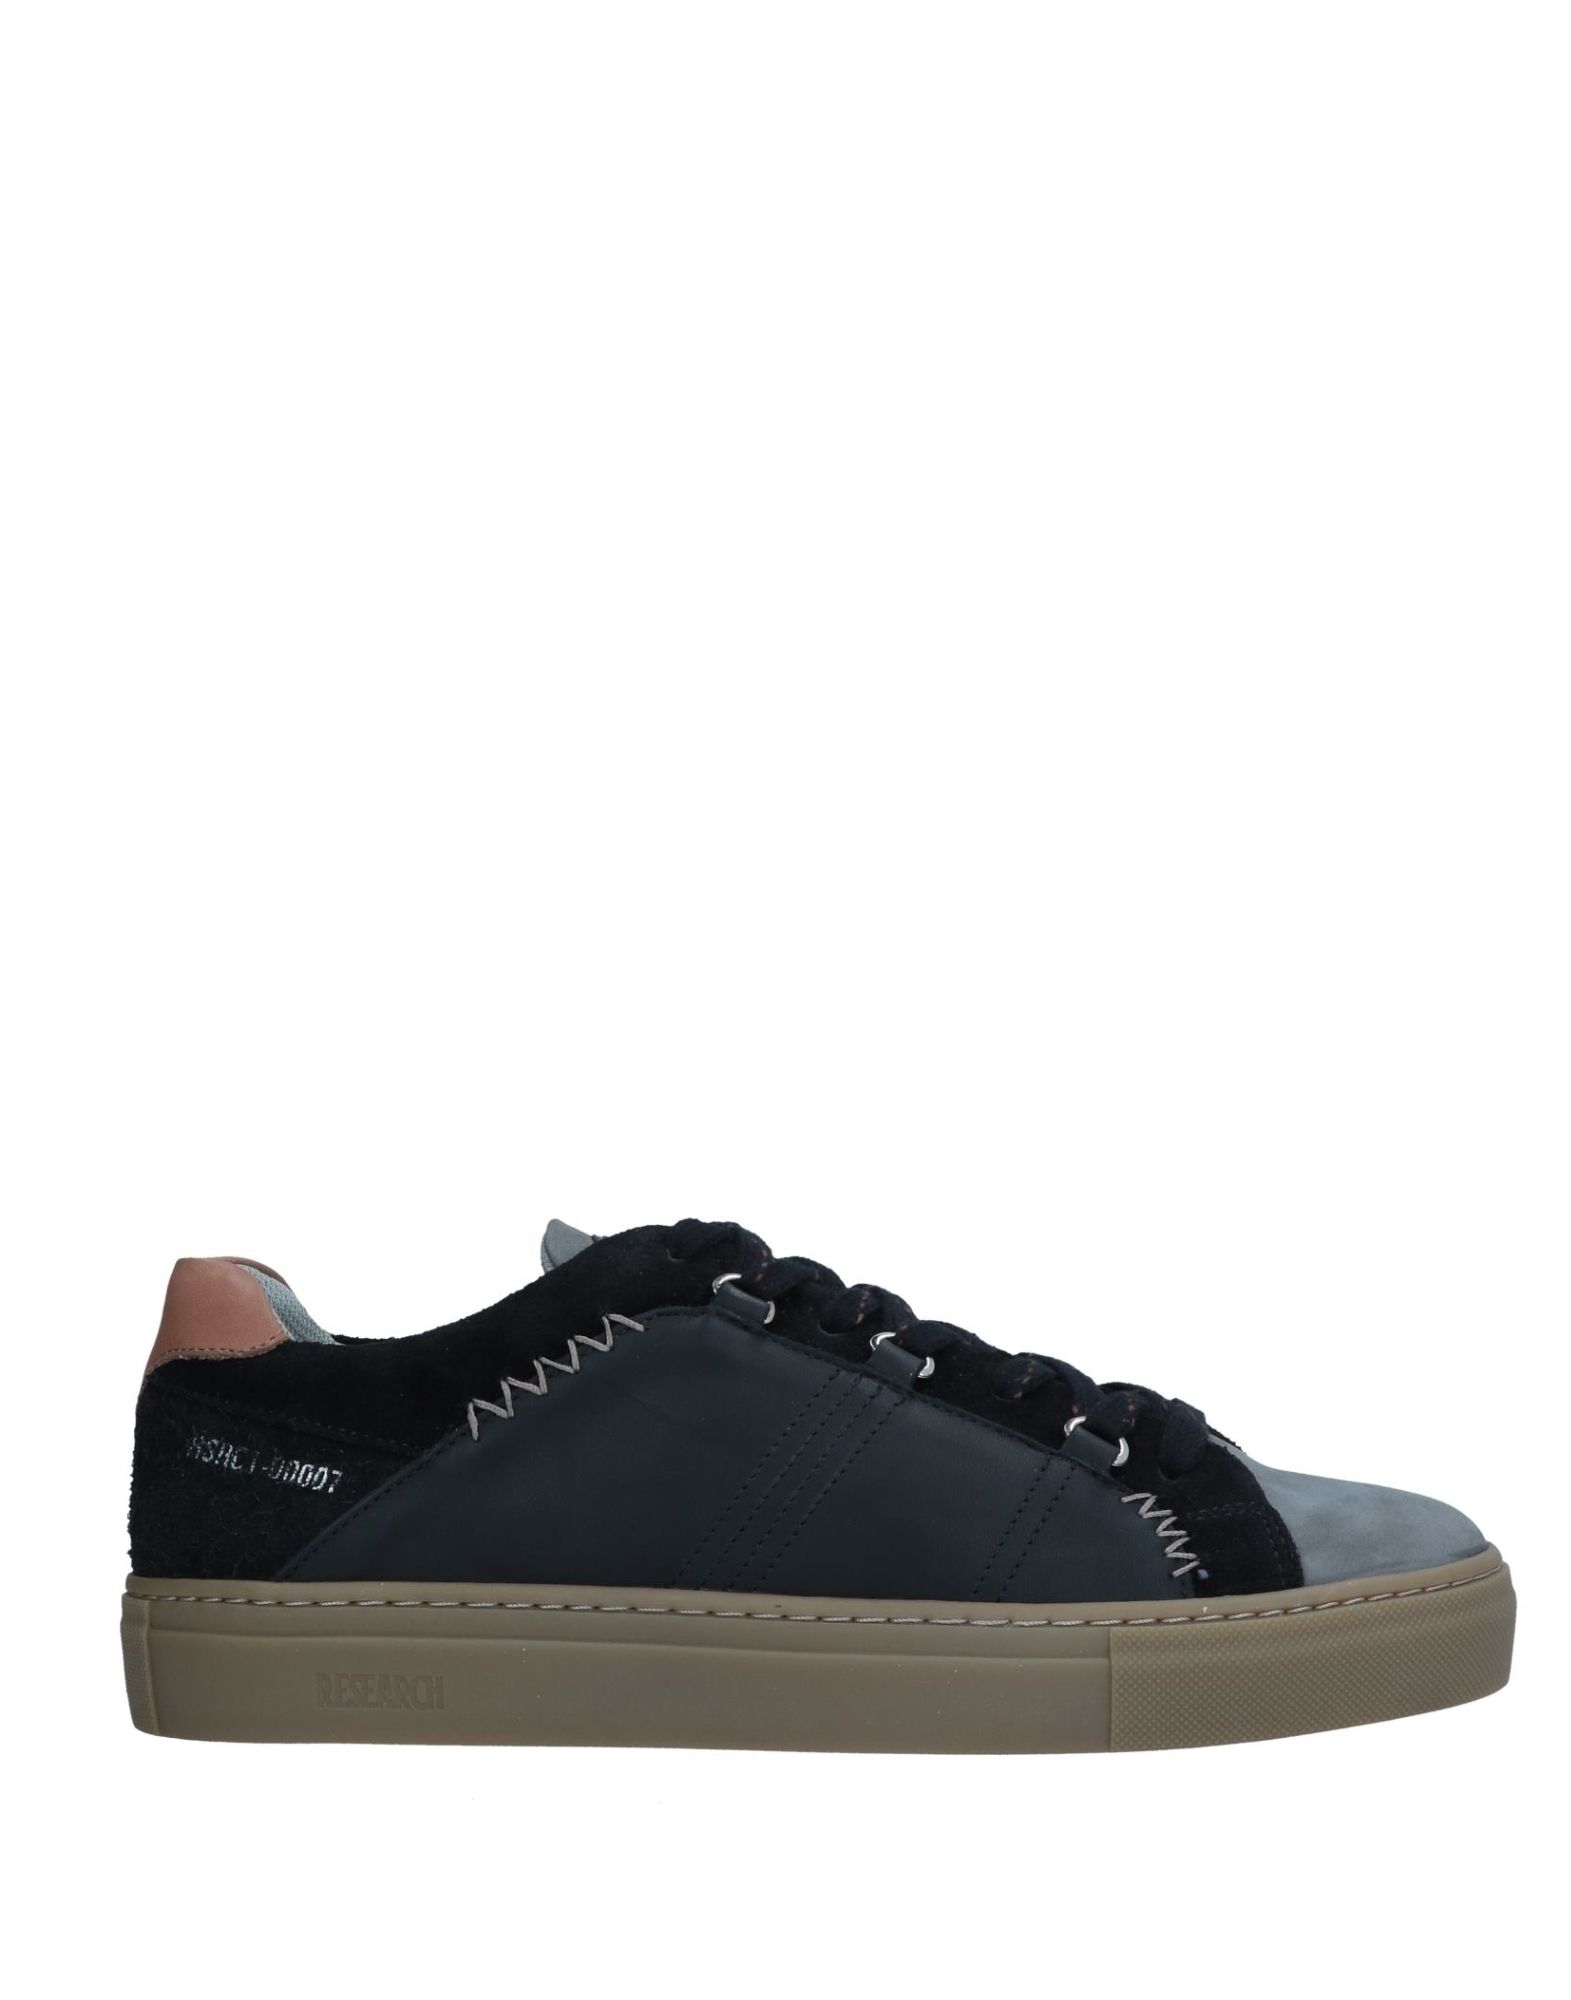 Sneakers Colmar Uomo - 11546492IC elegante